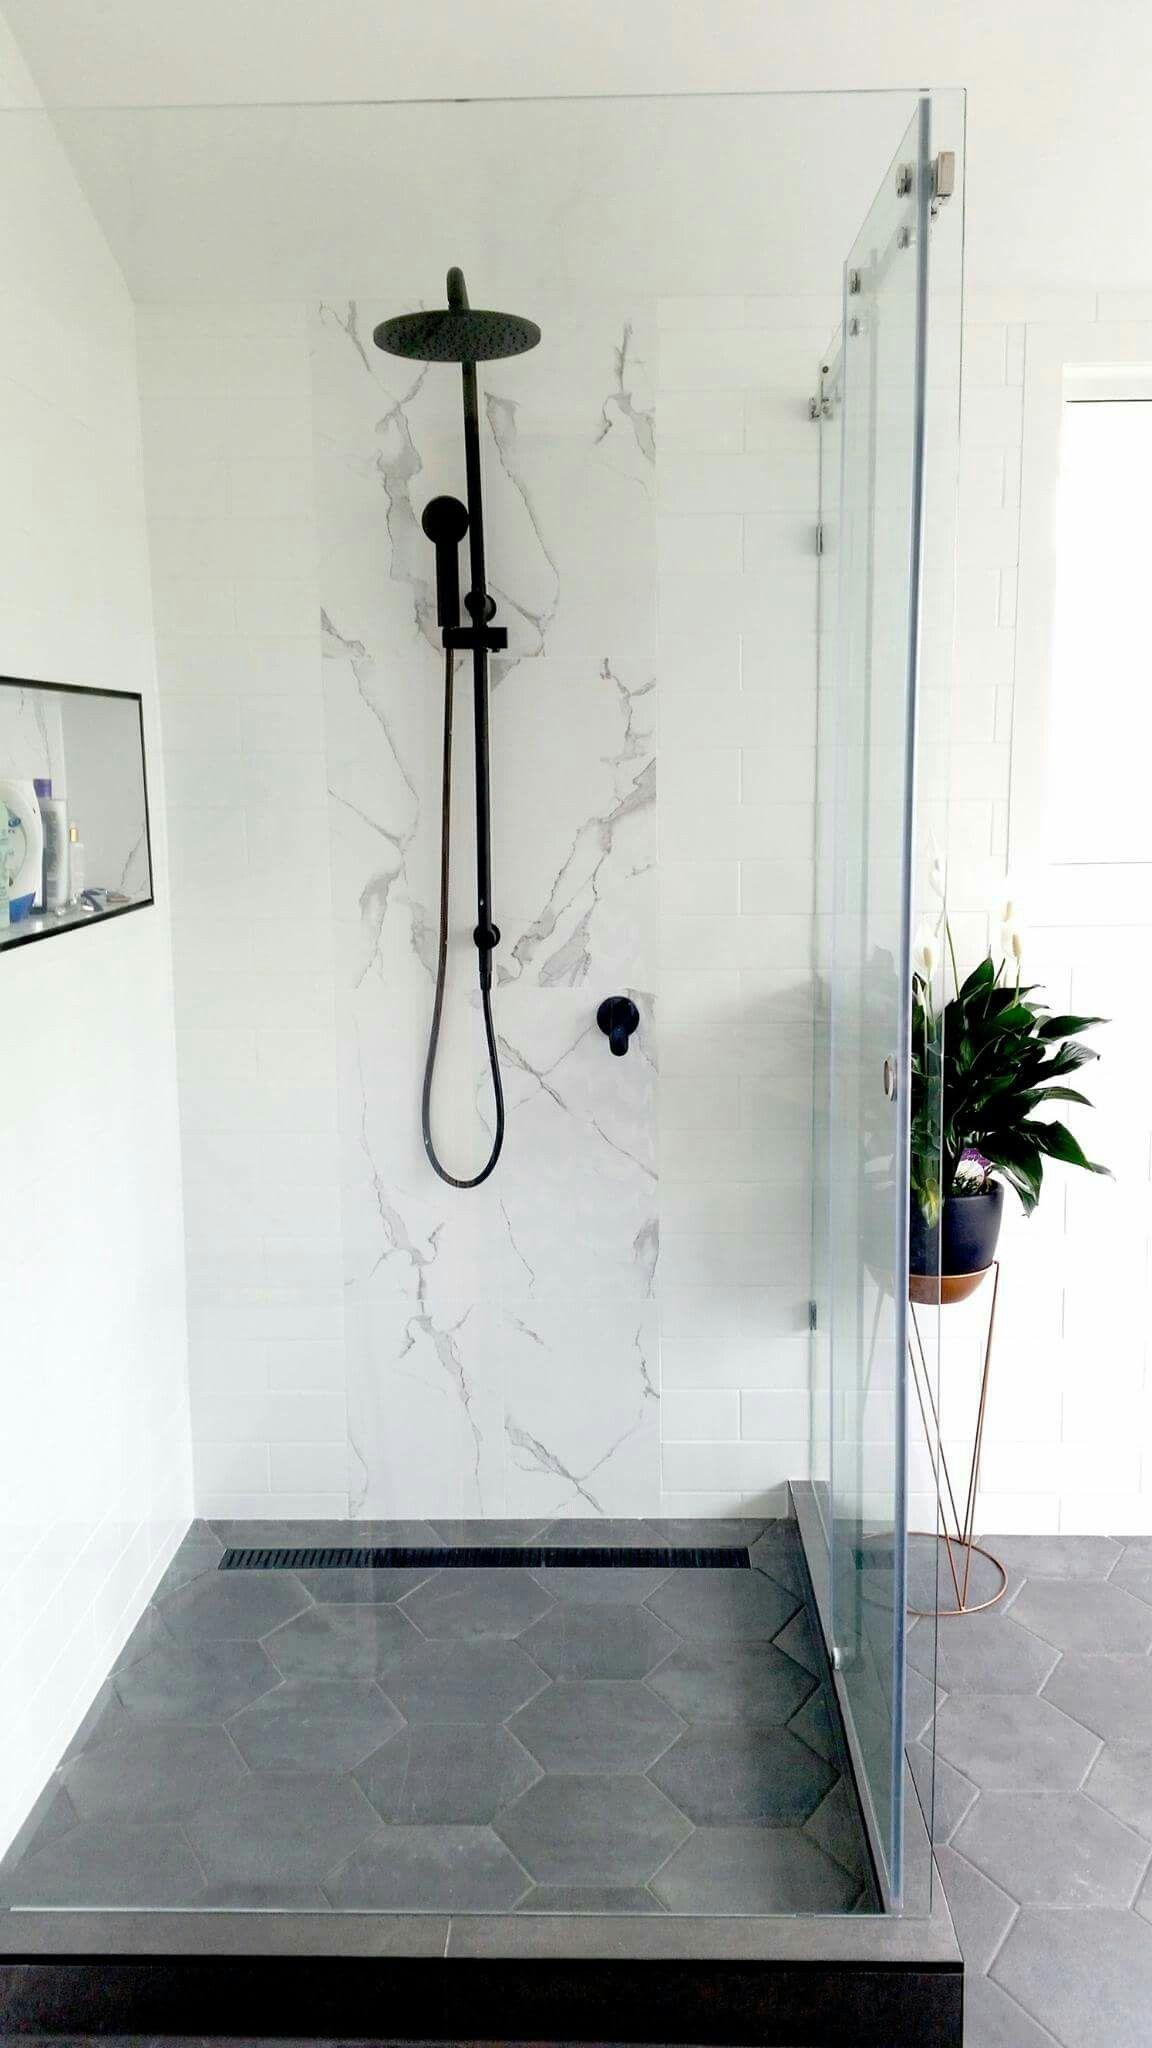 White Marble Subway Tiles Matte Black Our Ensuite Renovations Black Bathroom Floor Black Marble Bathroom White Marble Bathrooms